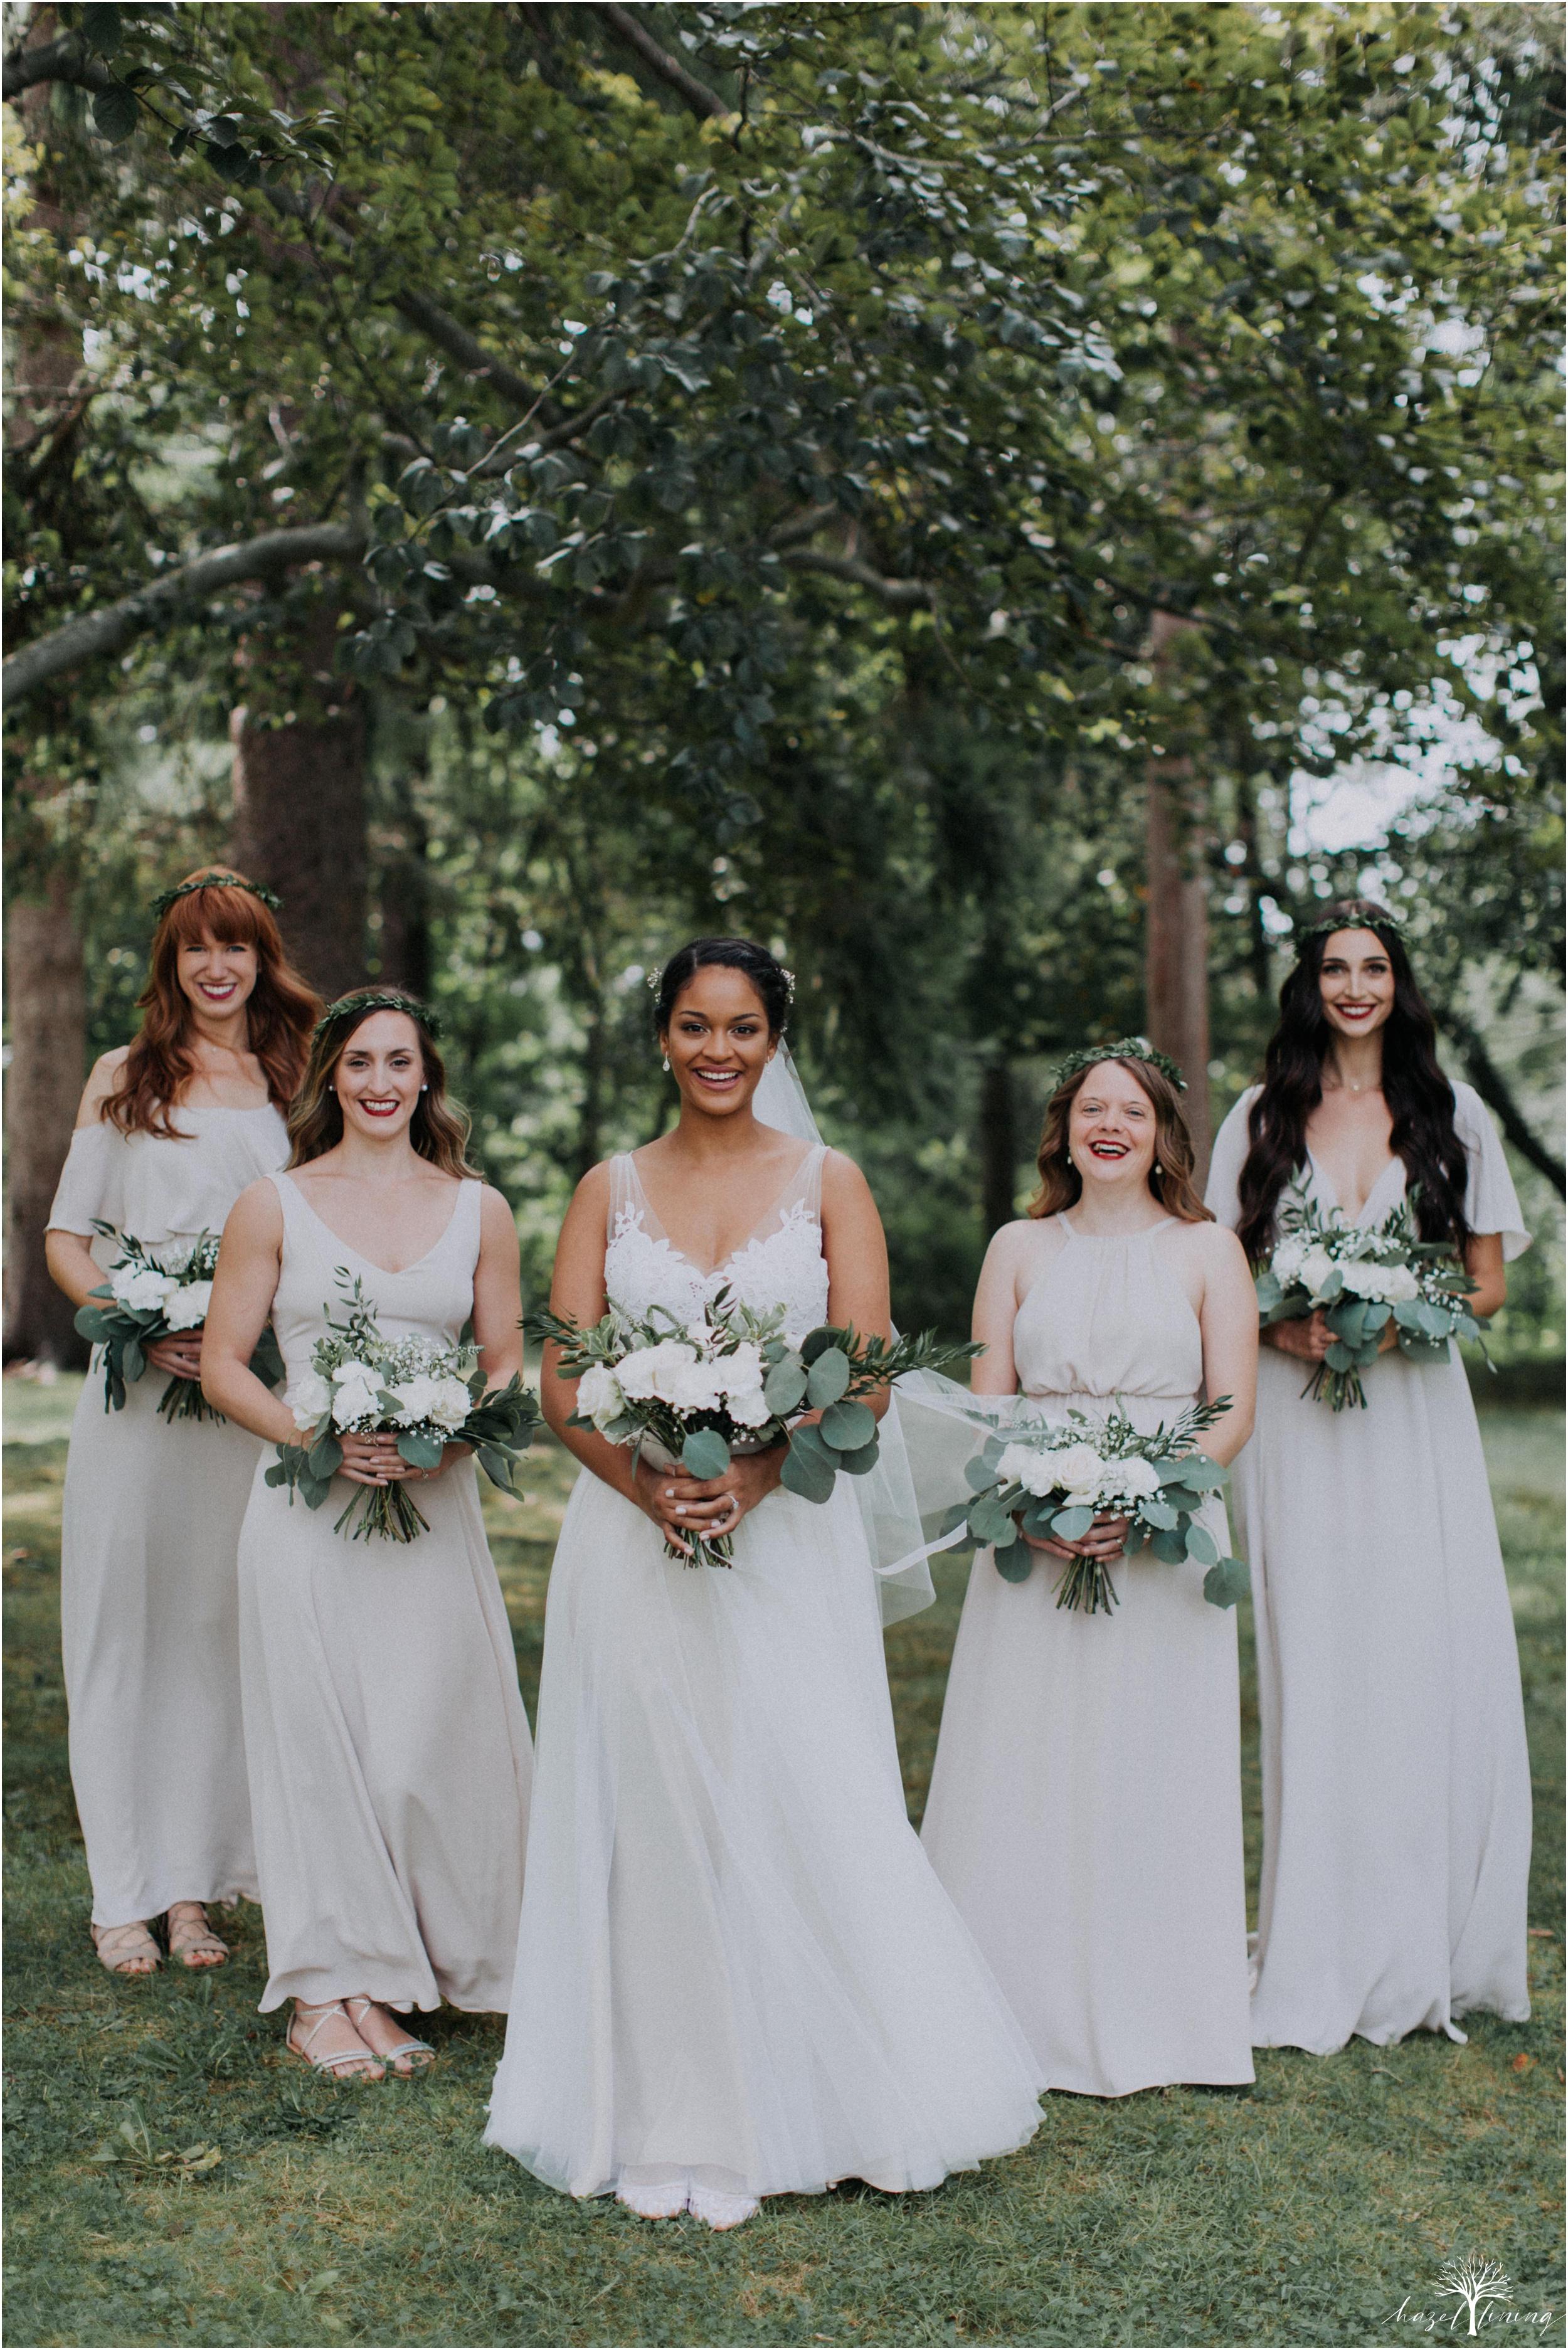 mariah-kreyling-samuel-sherratt-sherrattwiththeworld-peirce-farm-at-witch-hill-boston-massachusetts-wedding-photography-hazel-lining-travel-wedding-elopement-photography_0033.jpg